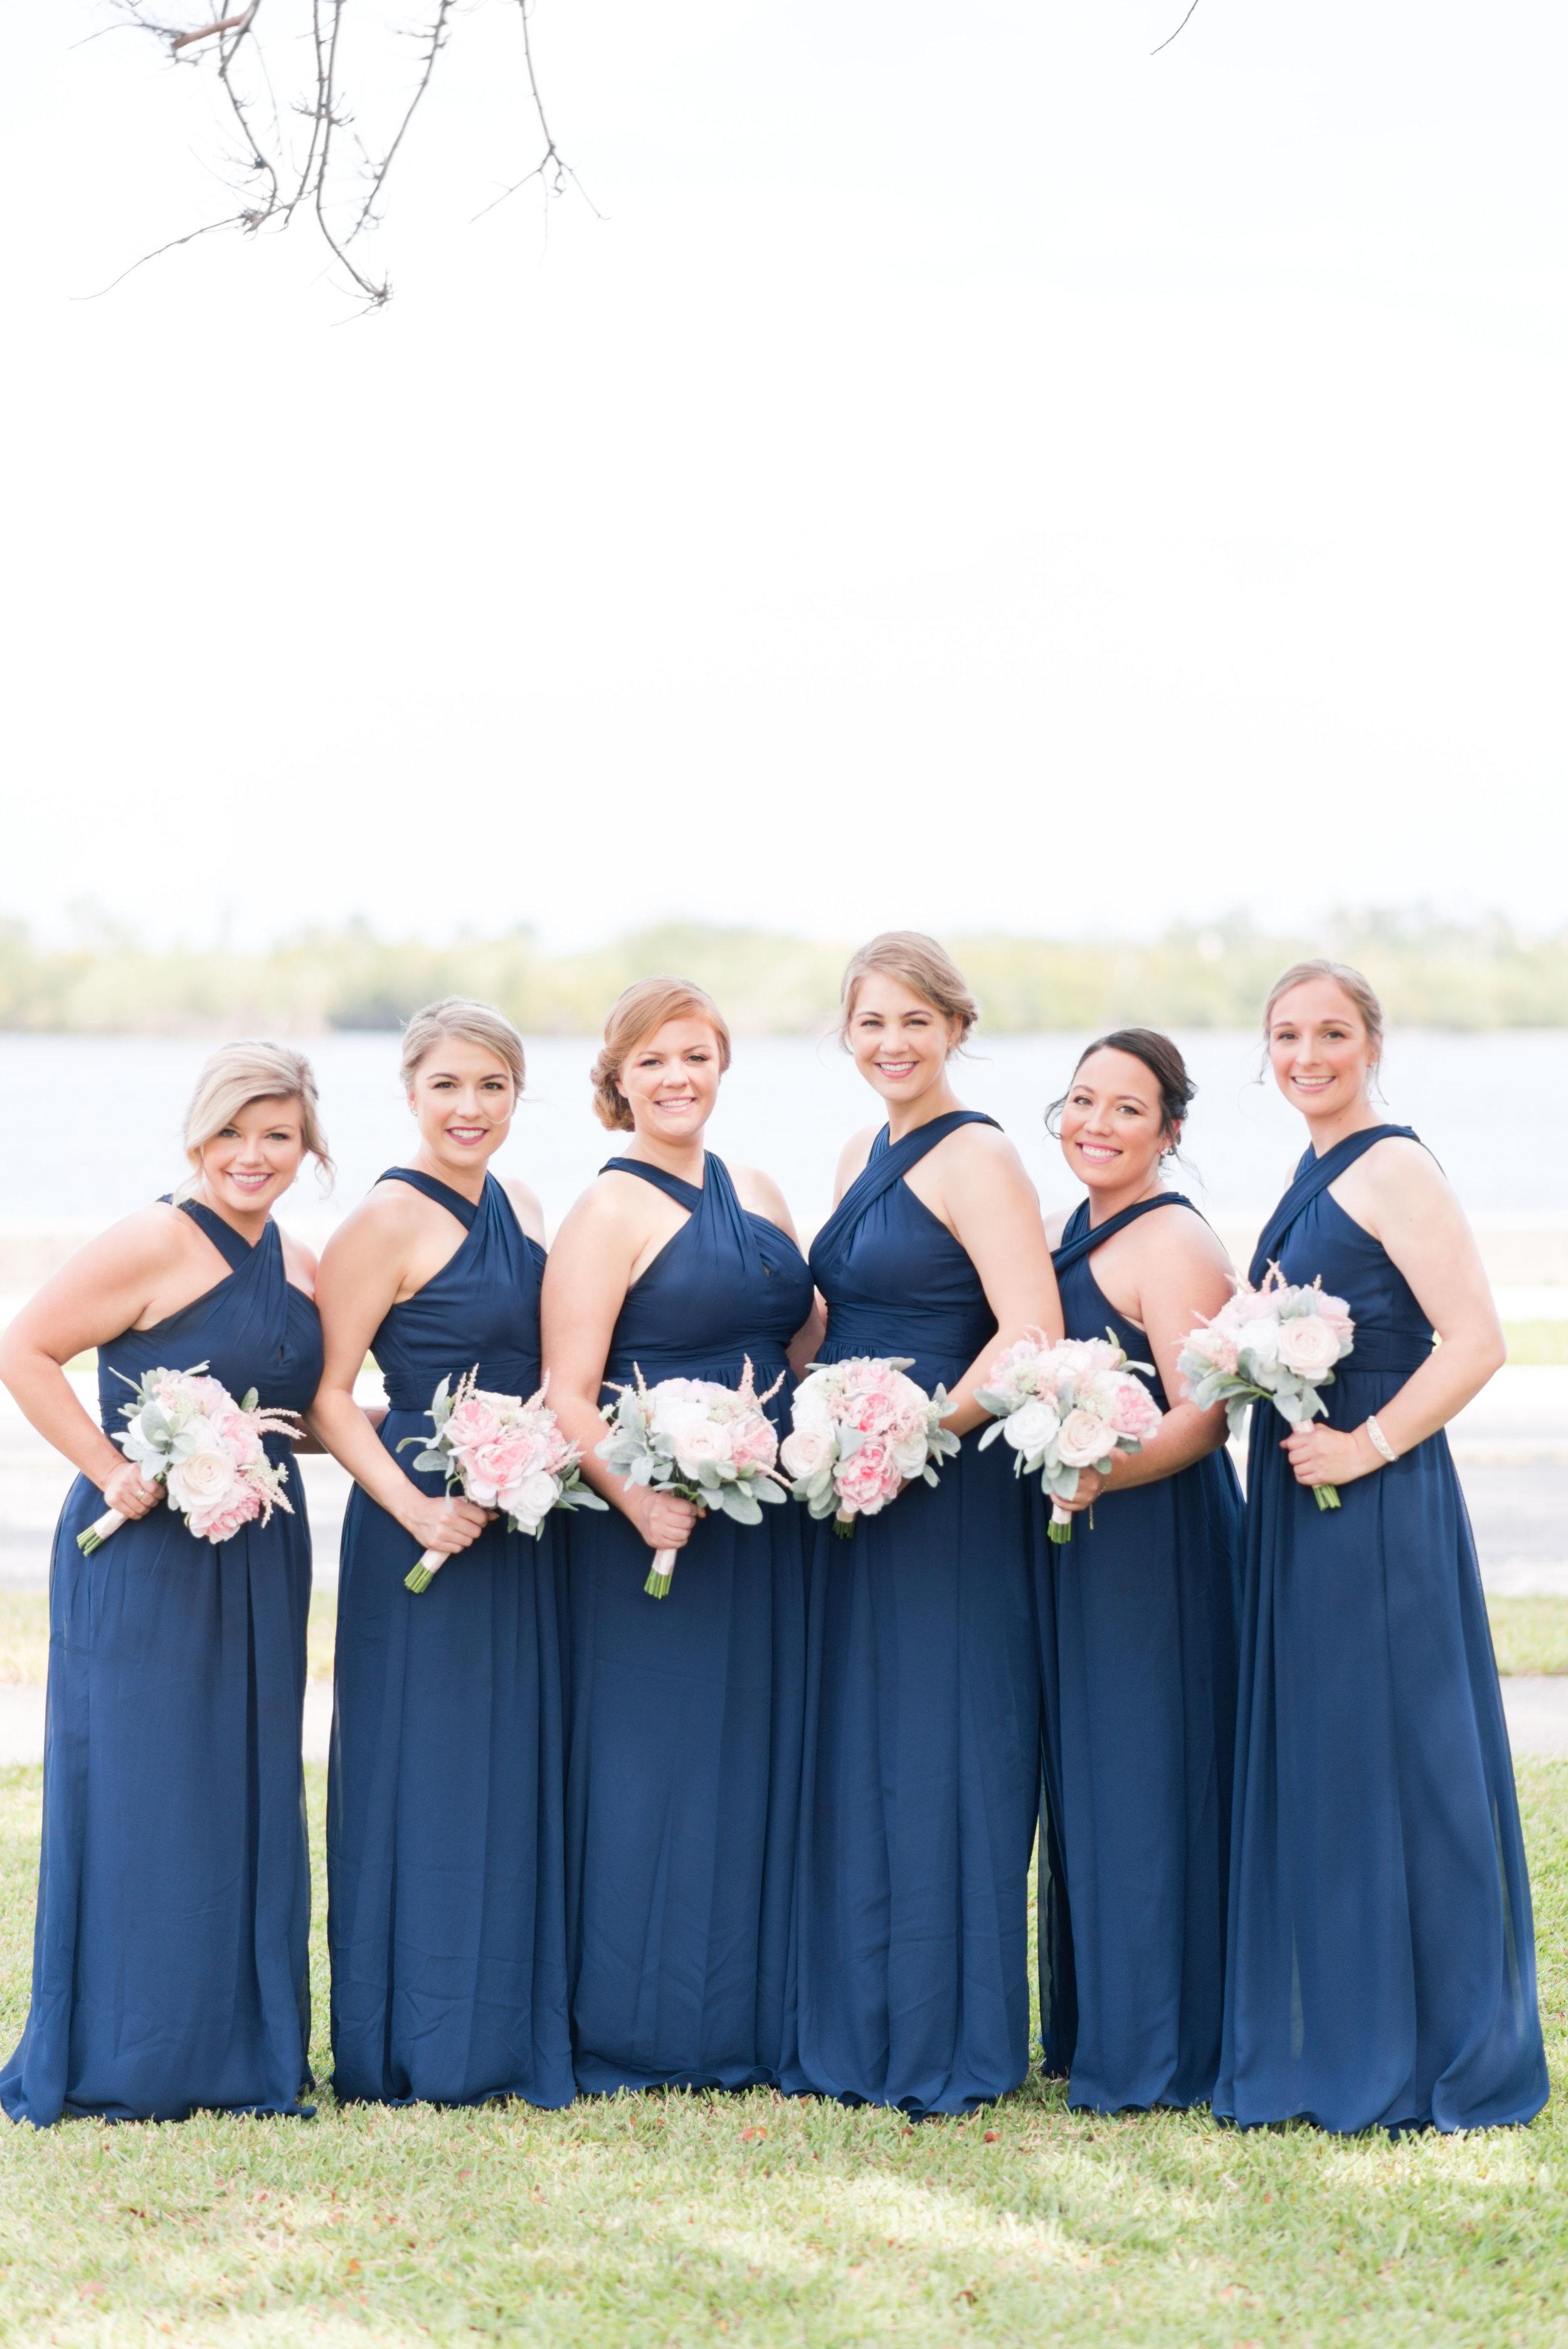 2019_04_06_Hart_Wedding_CMageePhotography_4.jpg